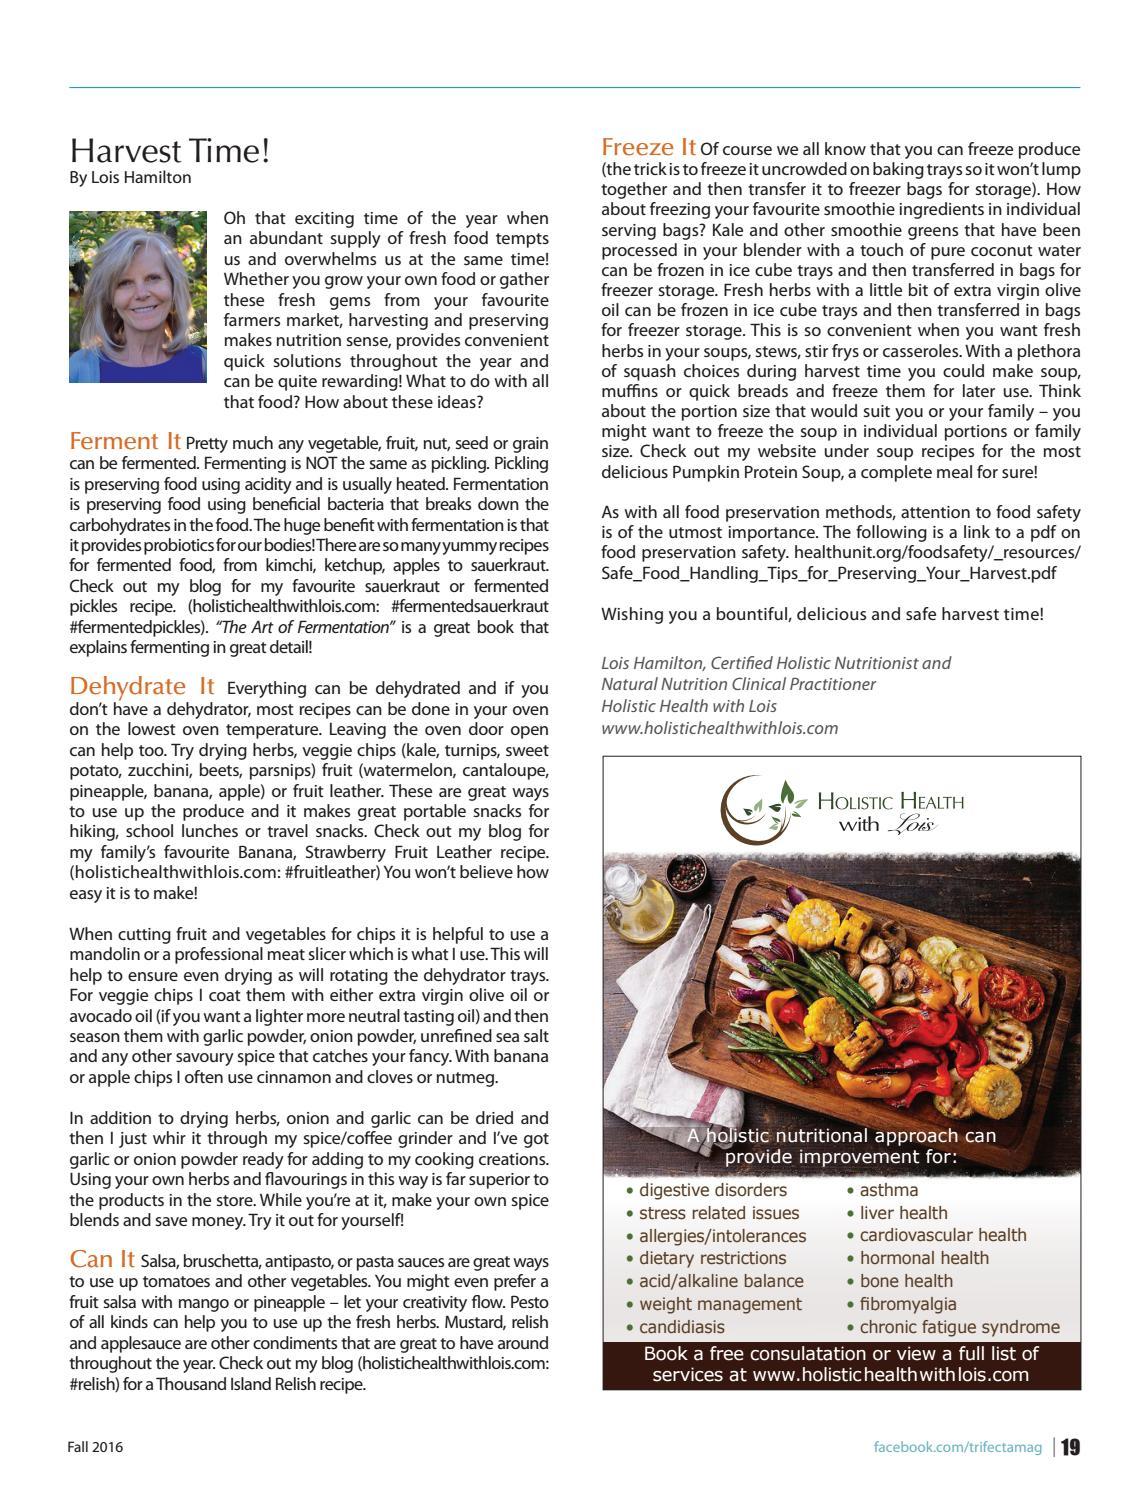 Trifecta Magazine Issue 12: Fall 2016 by Trifecta Magazine